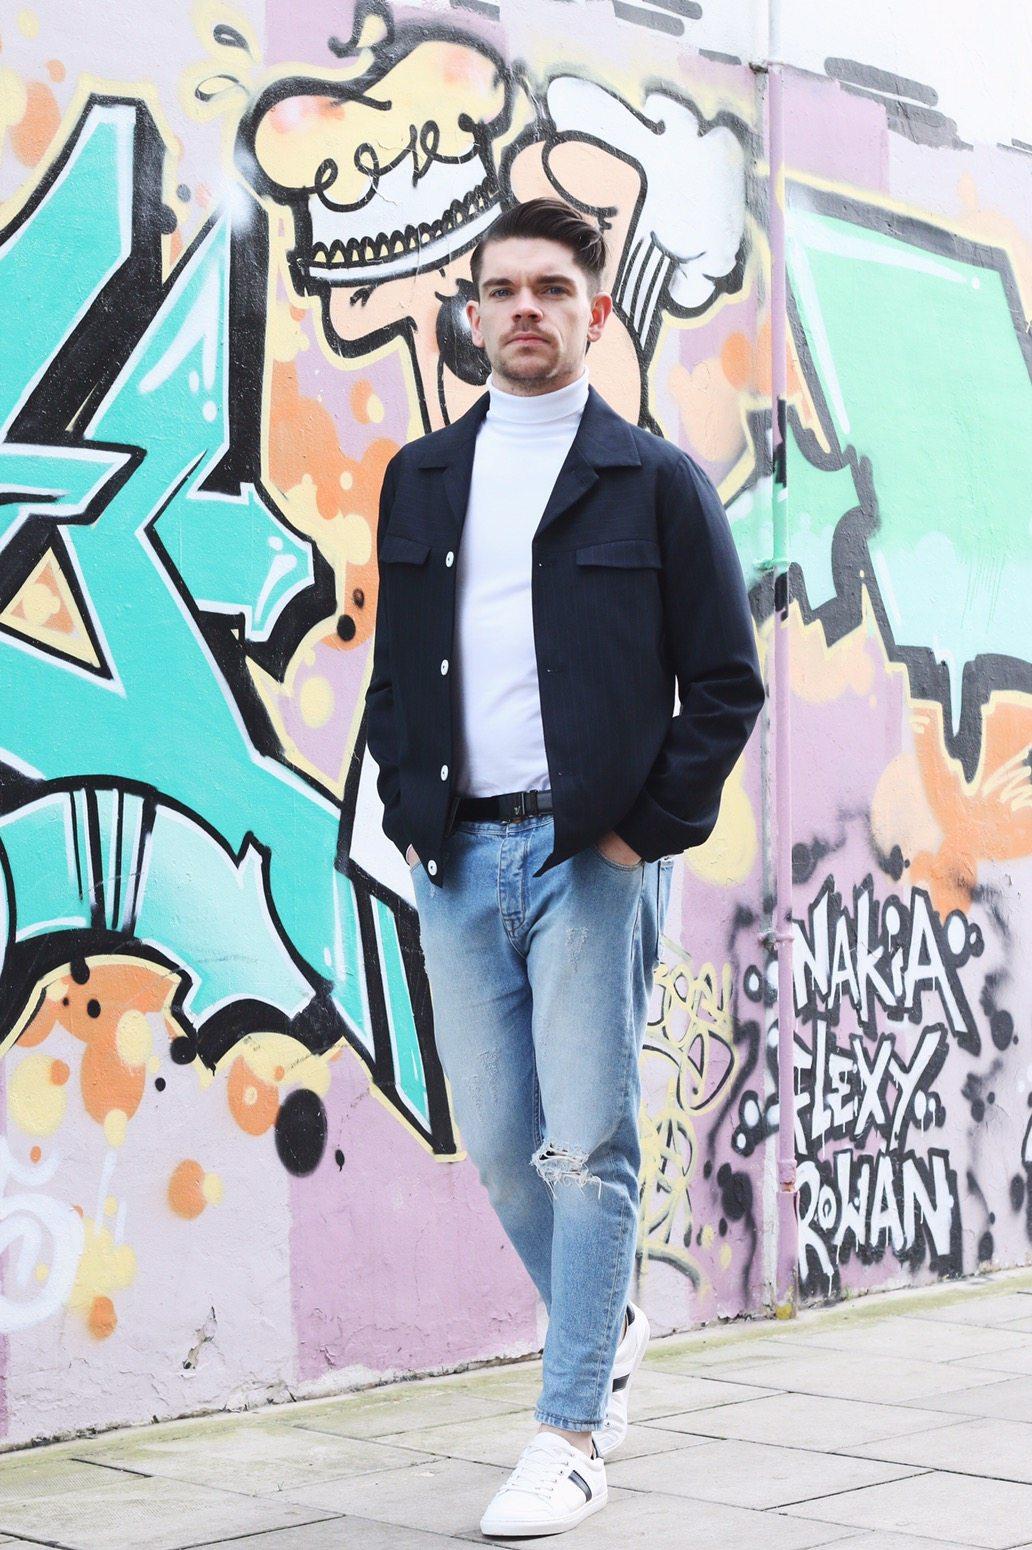 Robin-James-Man-For-Himself-Menswear-Outfit-ASOS-Denim